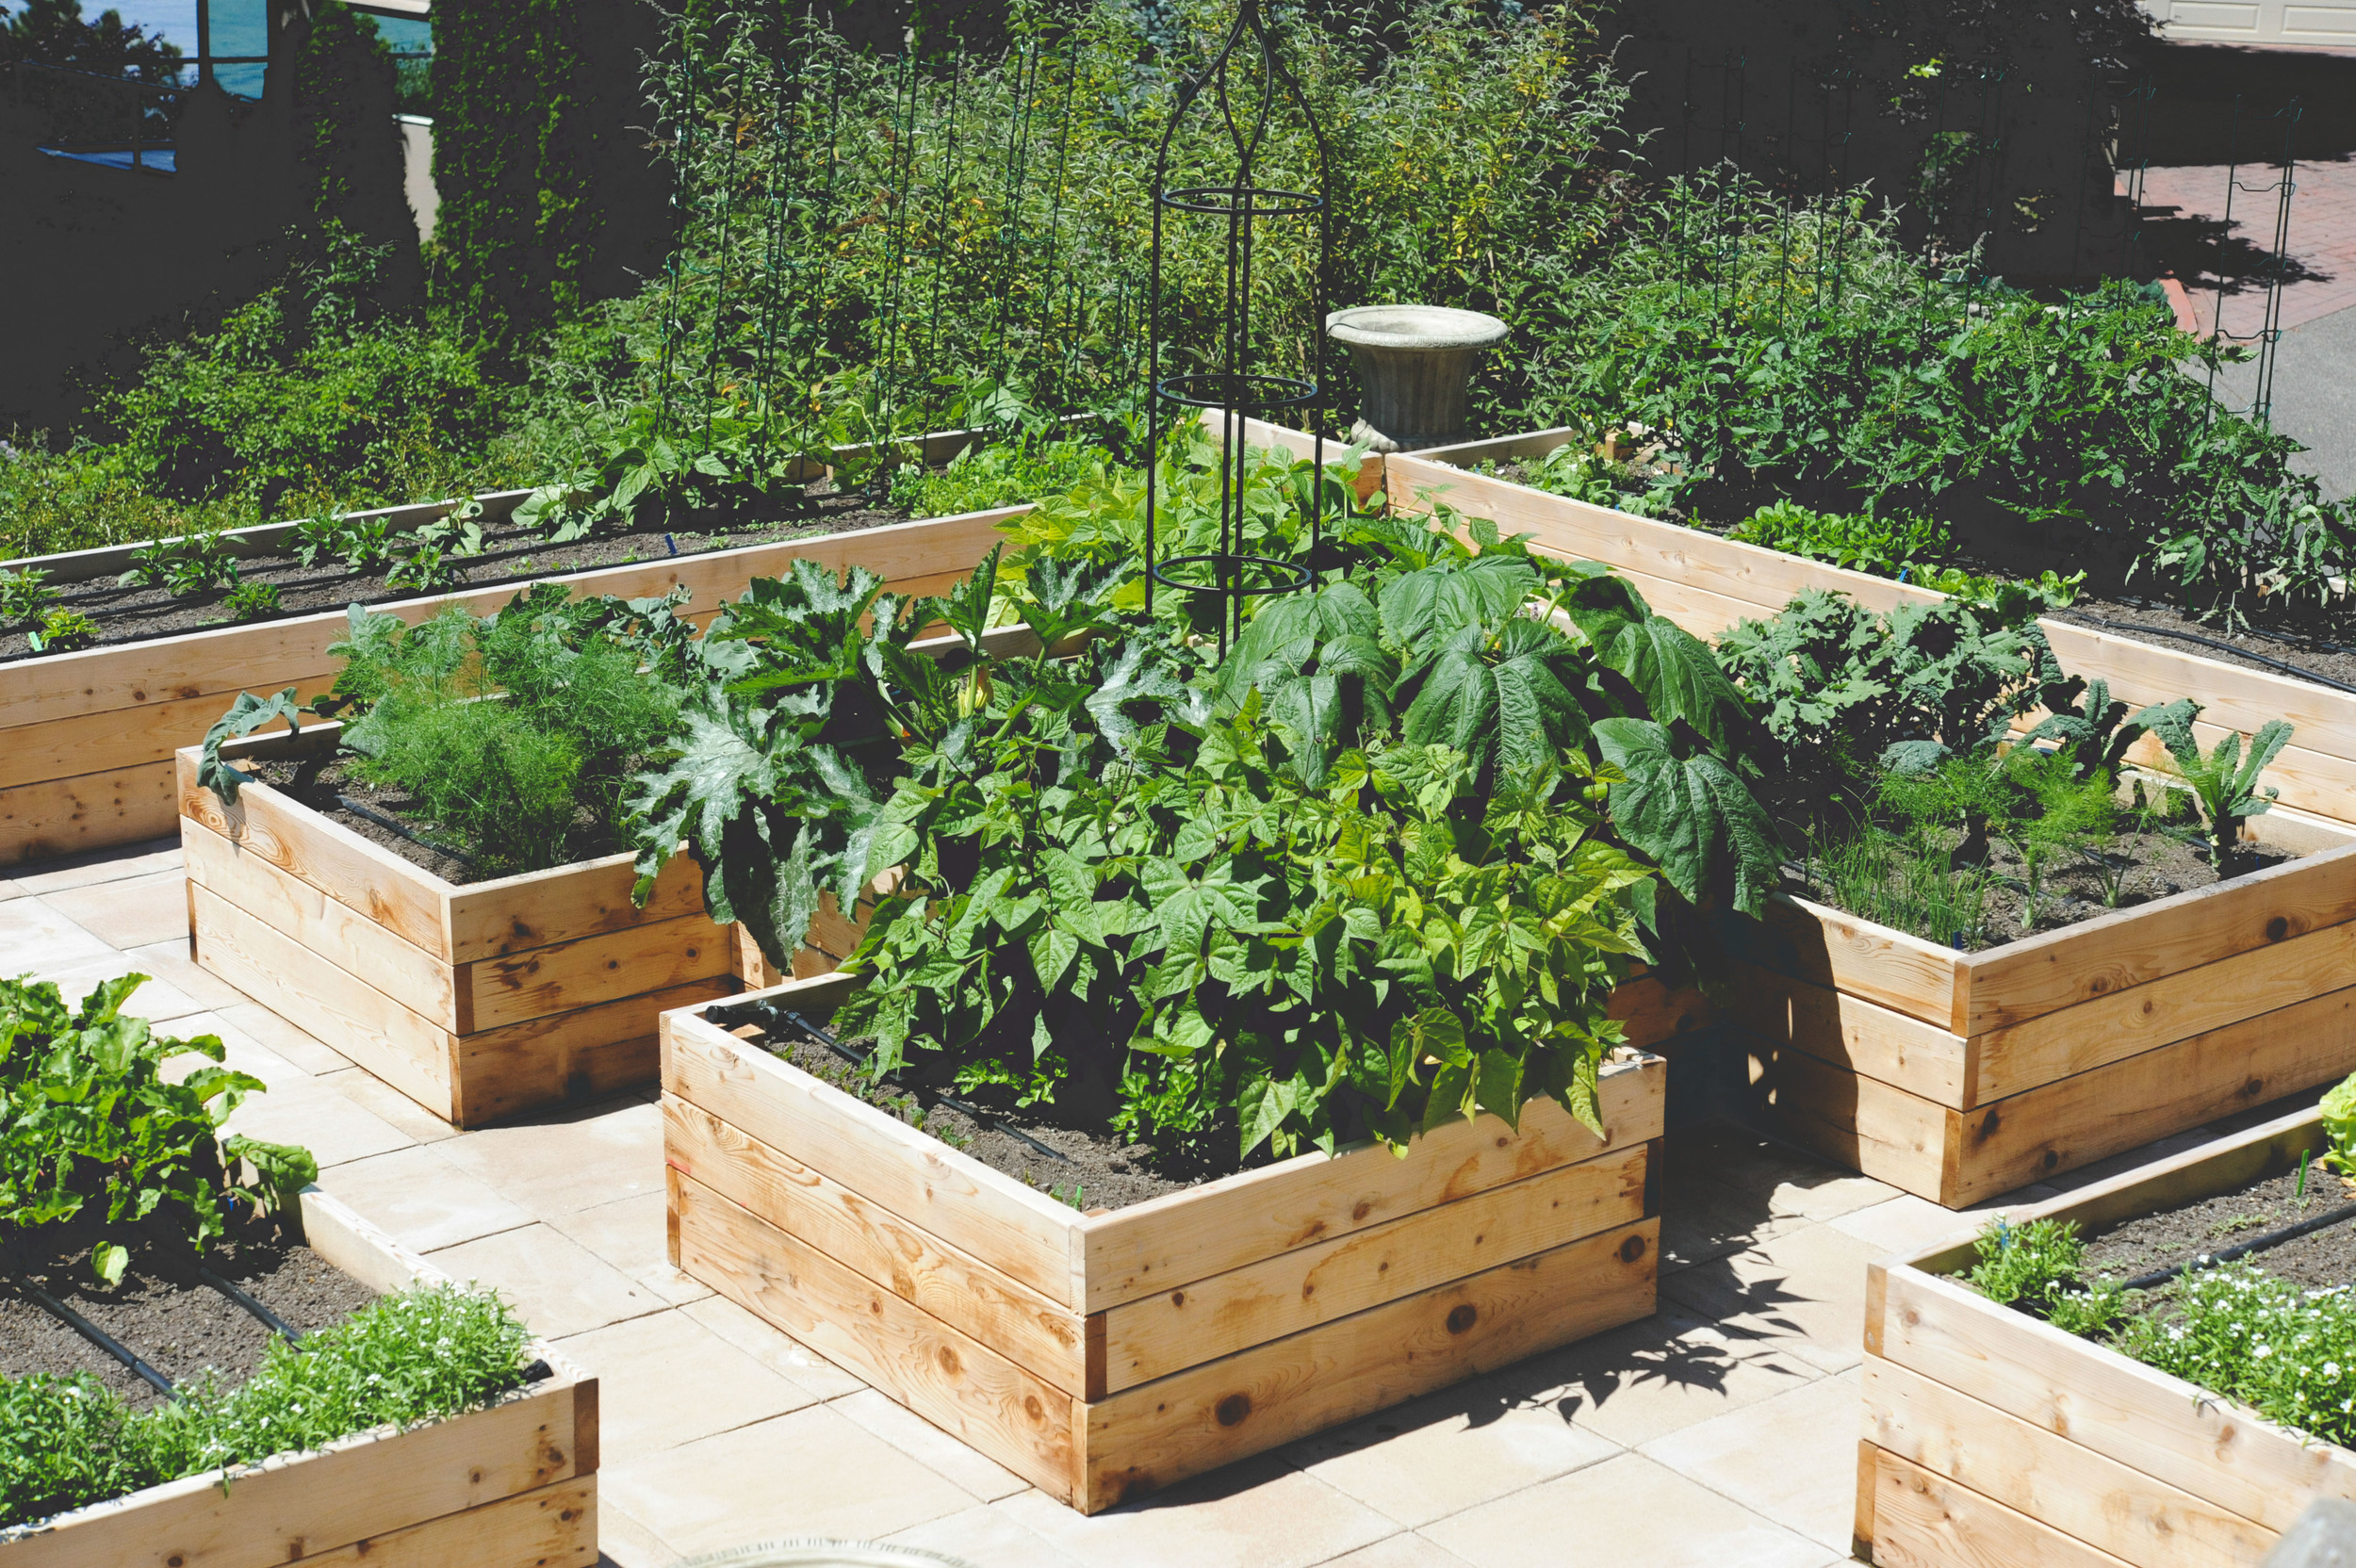 Rooftop_kitchen garden_Seattle Urban Farm Company